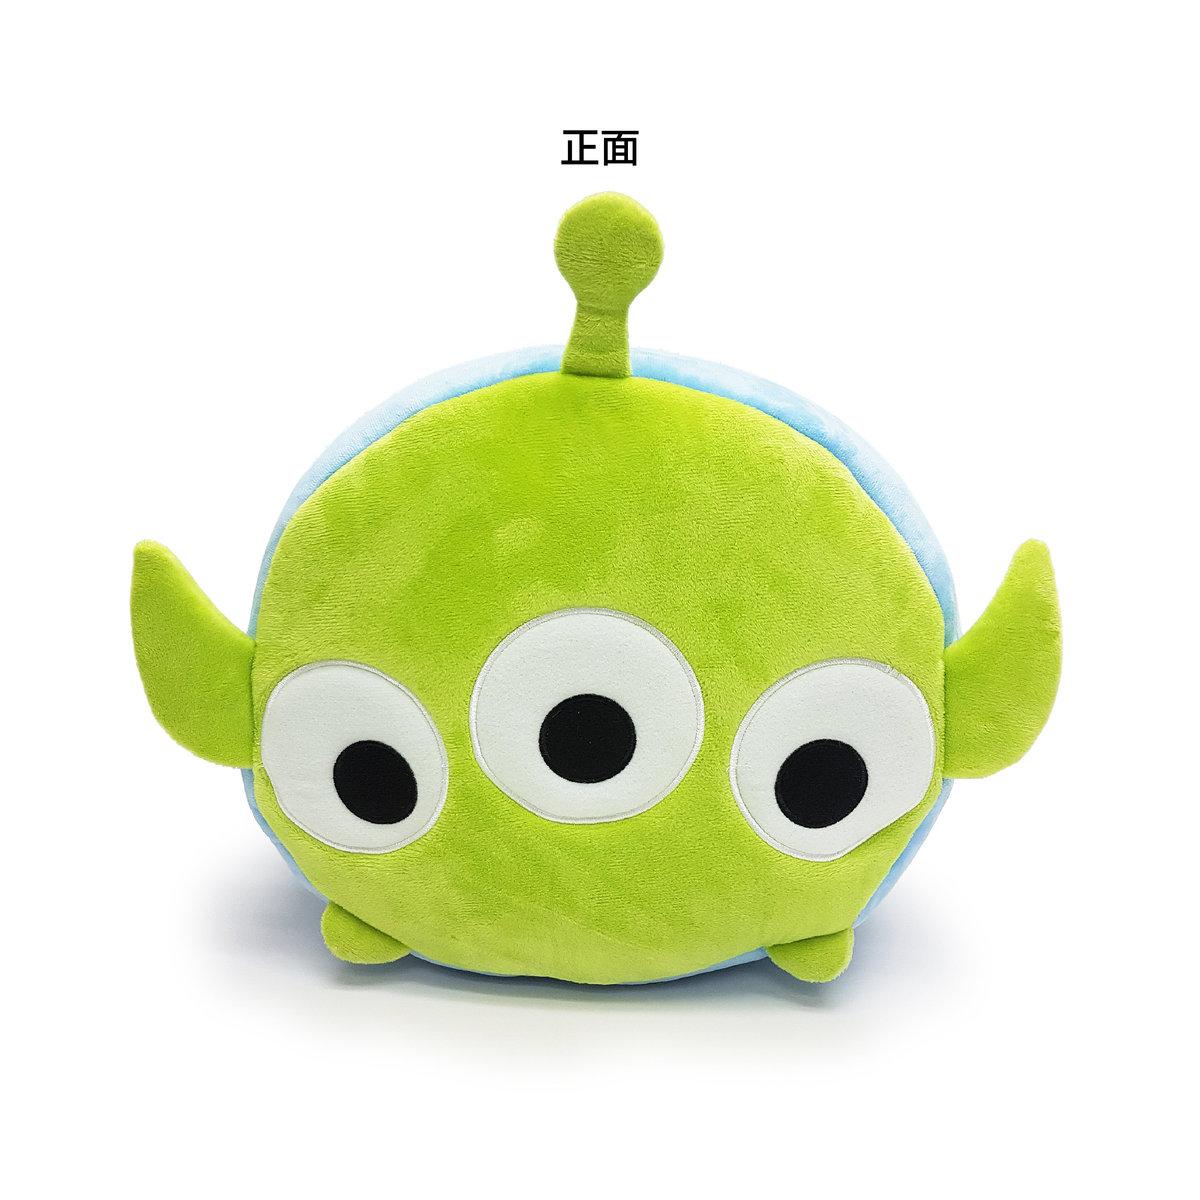 Disney - Tusm Tsum - Alien cushion (Licensed by Disney)